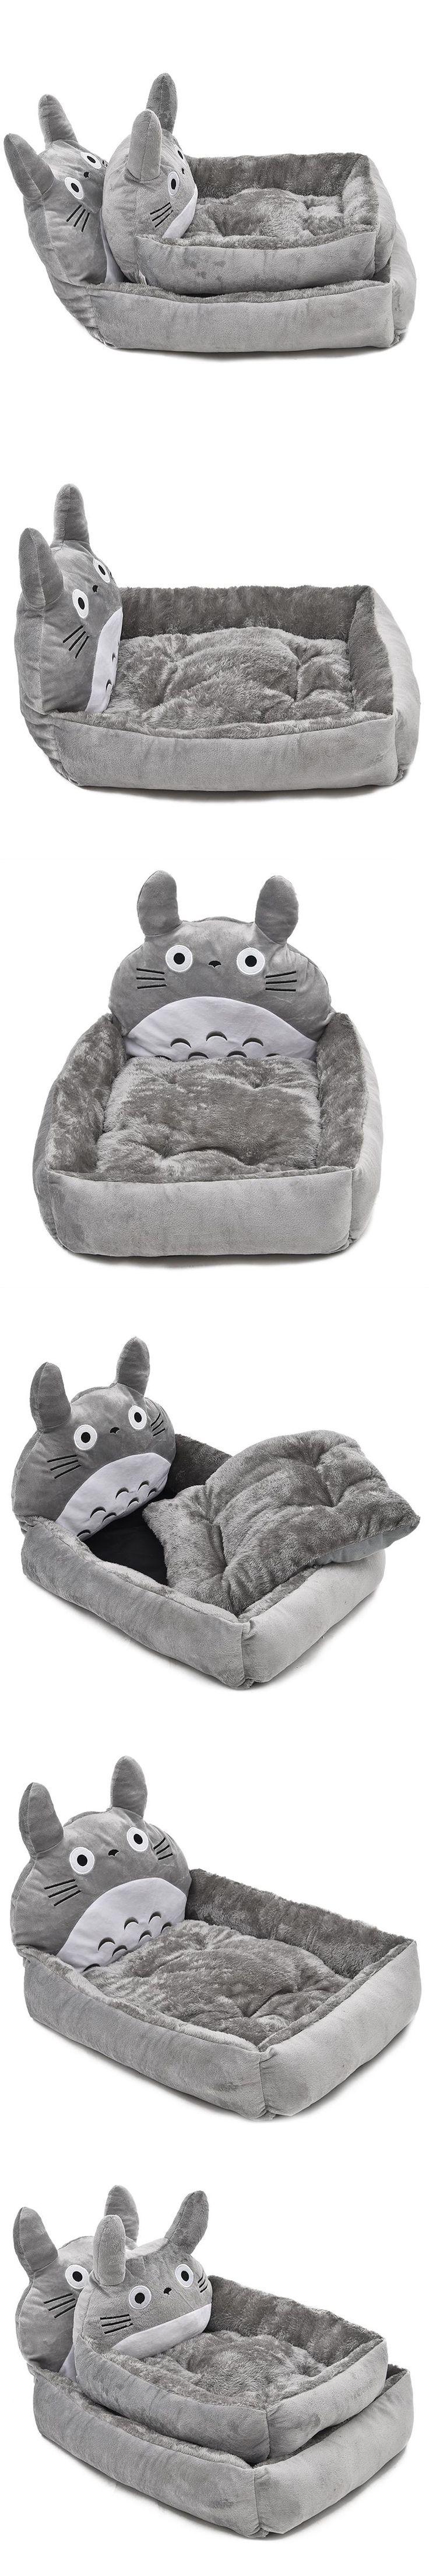 Free Shipping Pet Bed Dog Cat Bed Creative Novel Design Cute Lovely Cartoon Soft Short Fluff Material Pet Cushion